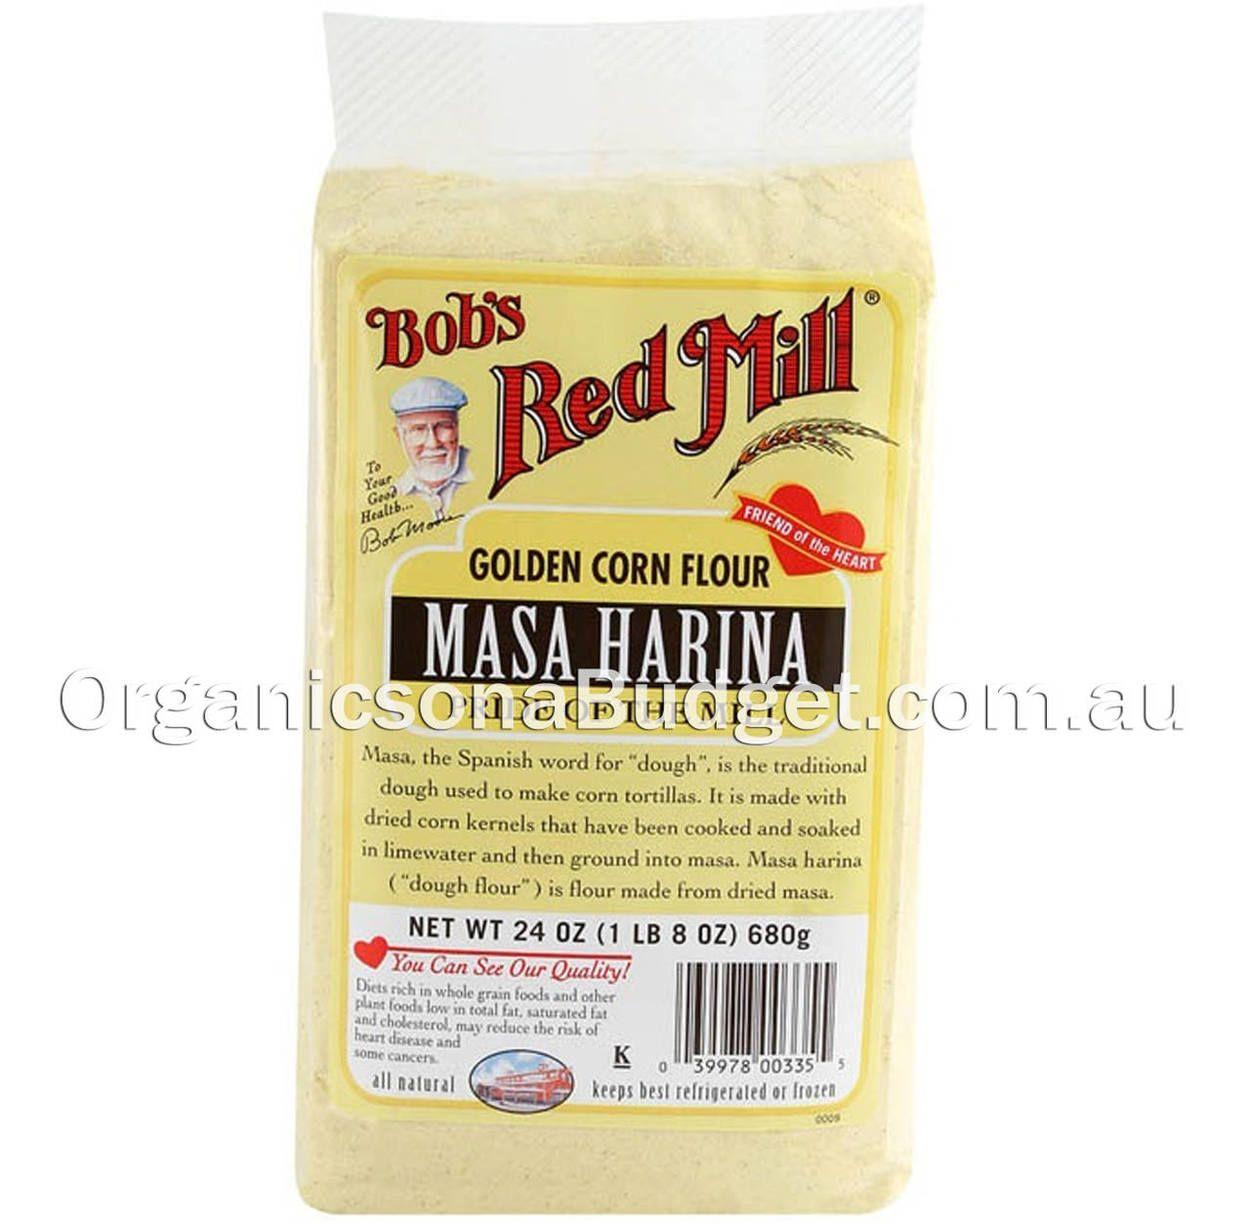 Bobs red mill gluten free masa harina golden corn flour